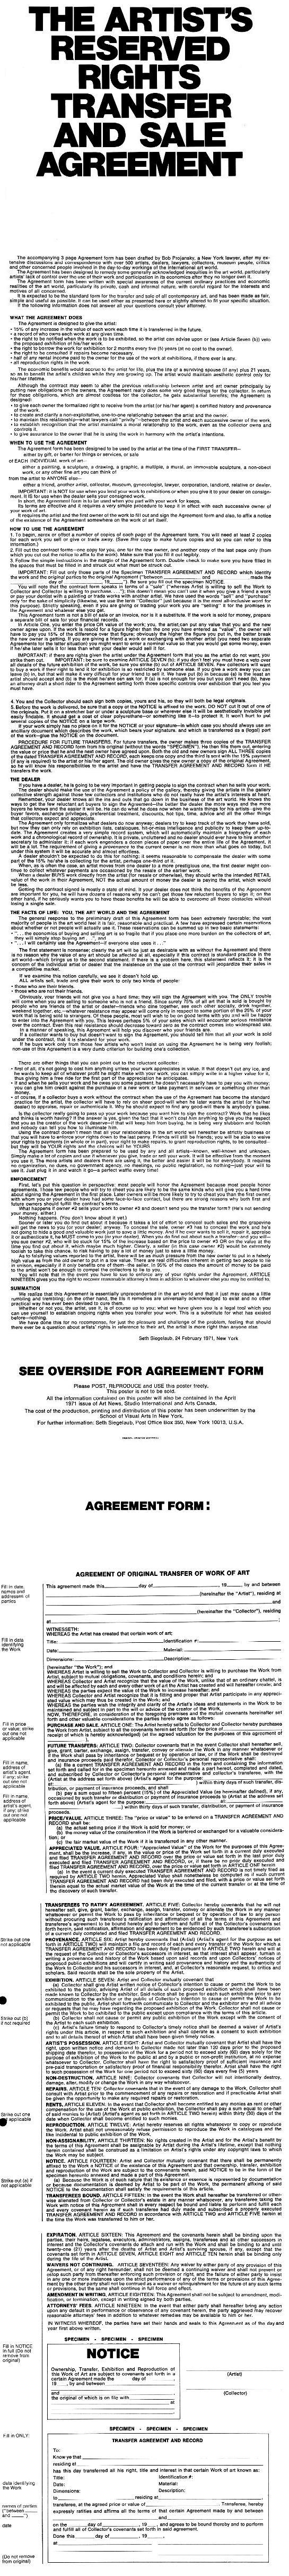 Standard Artist Agreement Form. ContractEN